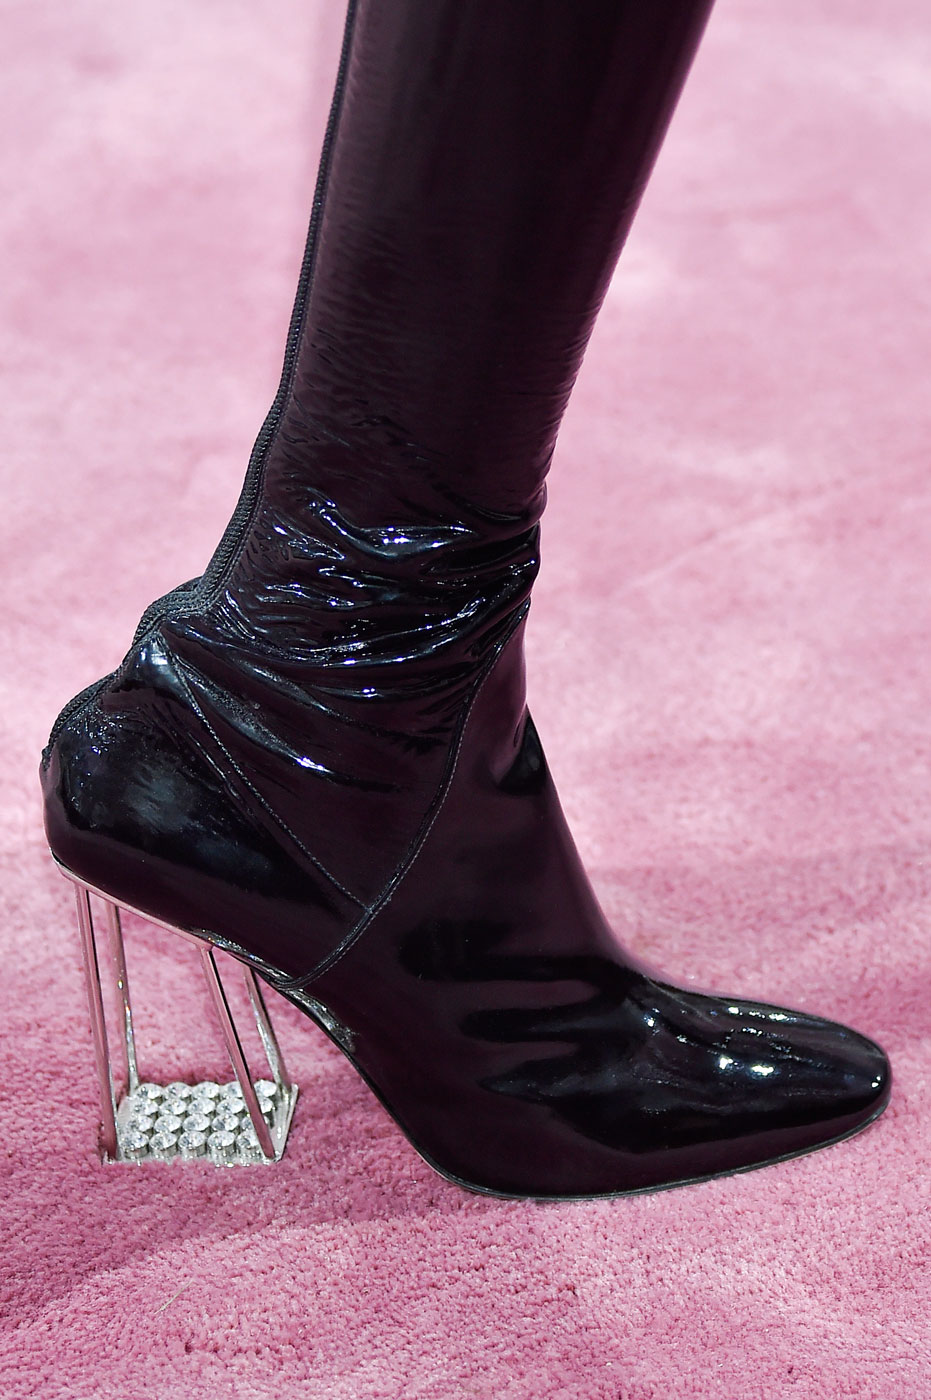 Christian-Dior-fashion-runway-show-close-ups-haute-couture-paris-spring-summer-2015-the-impression-092